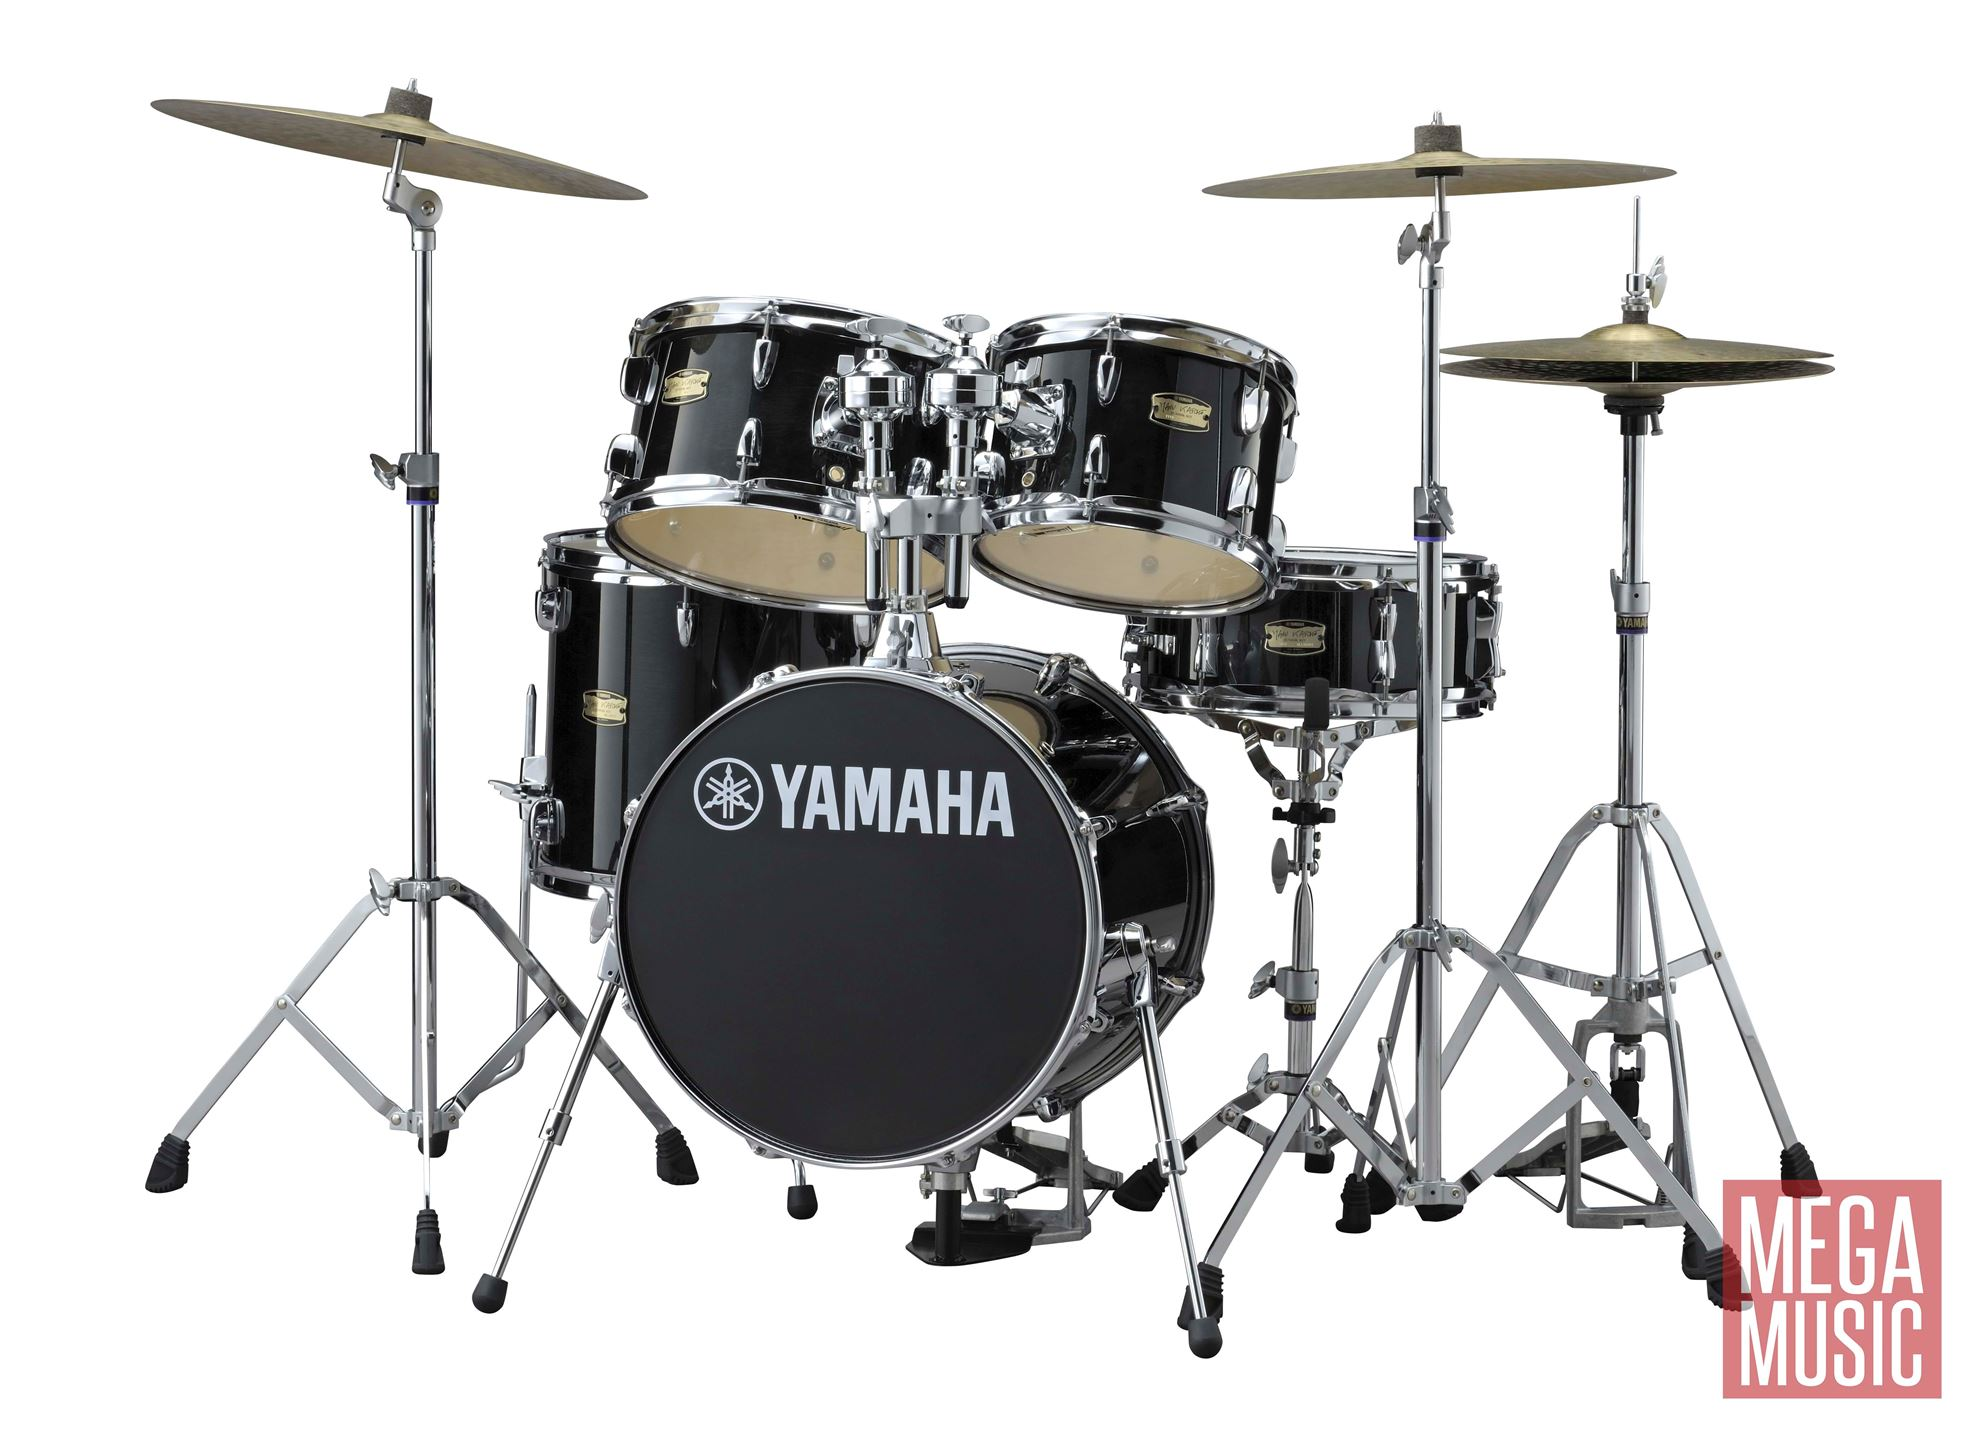 Yamaha manu katche junior drum kit in raven black lacquer for Yamaha portable drums